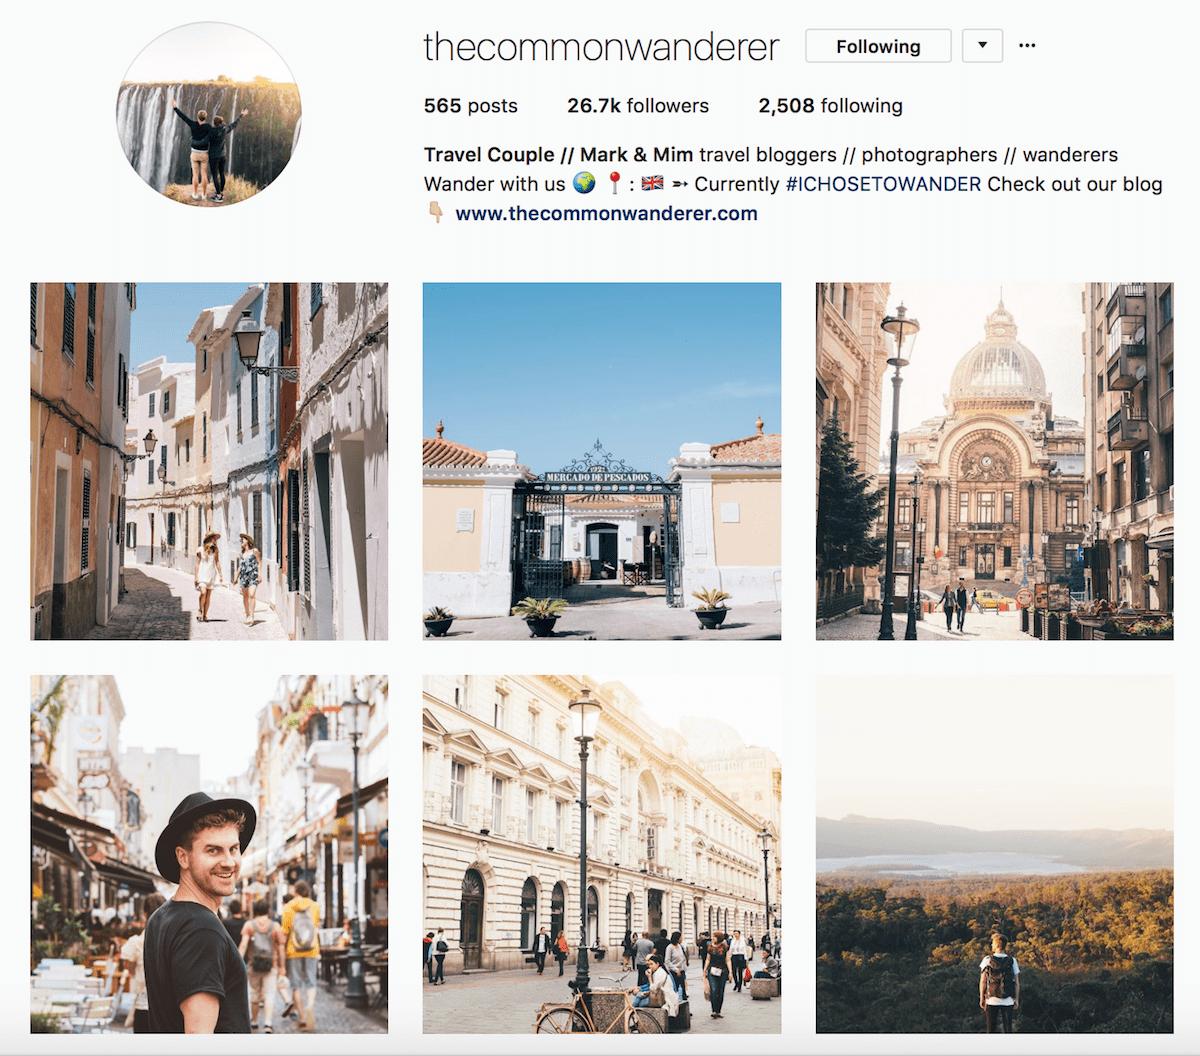 thecommonwanderer instagram gallery